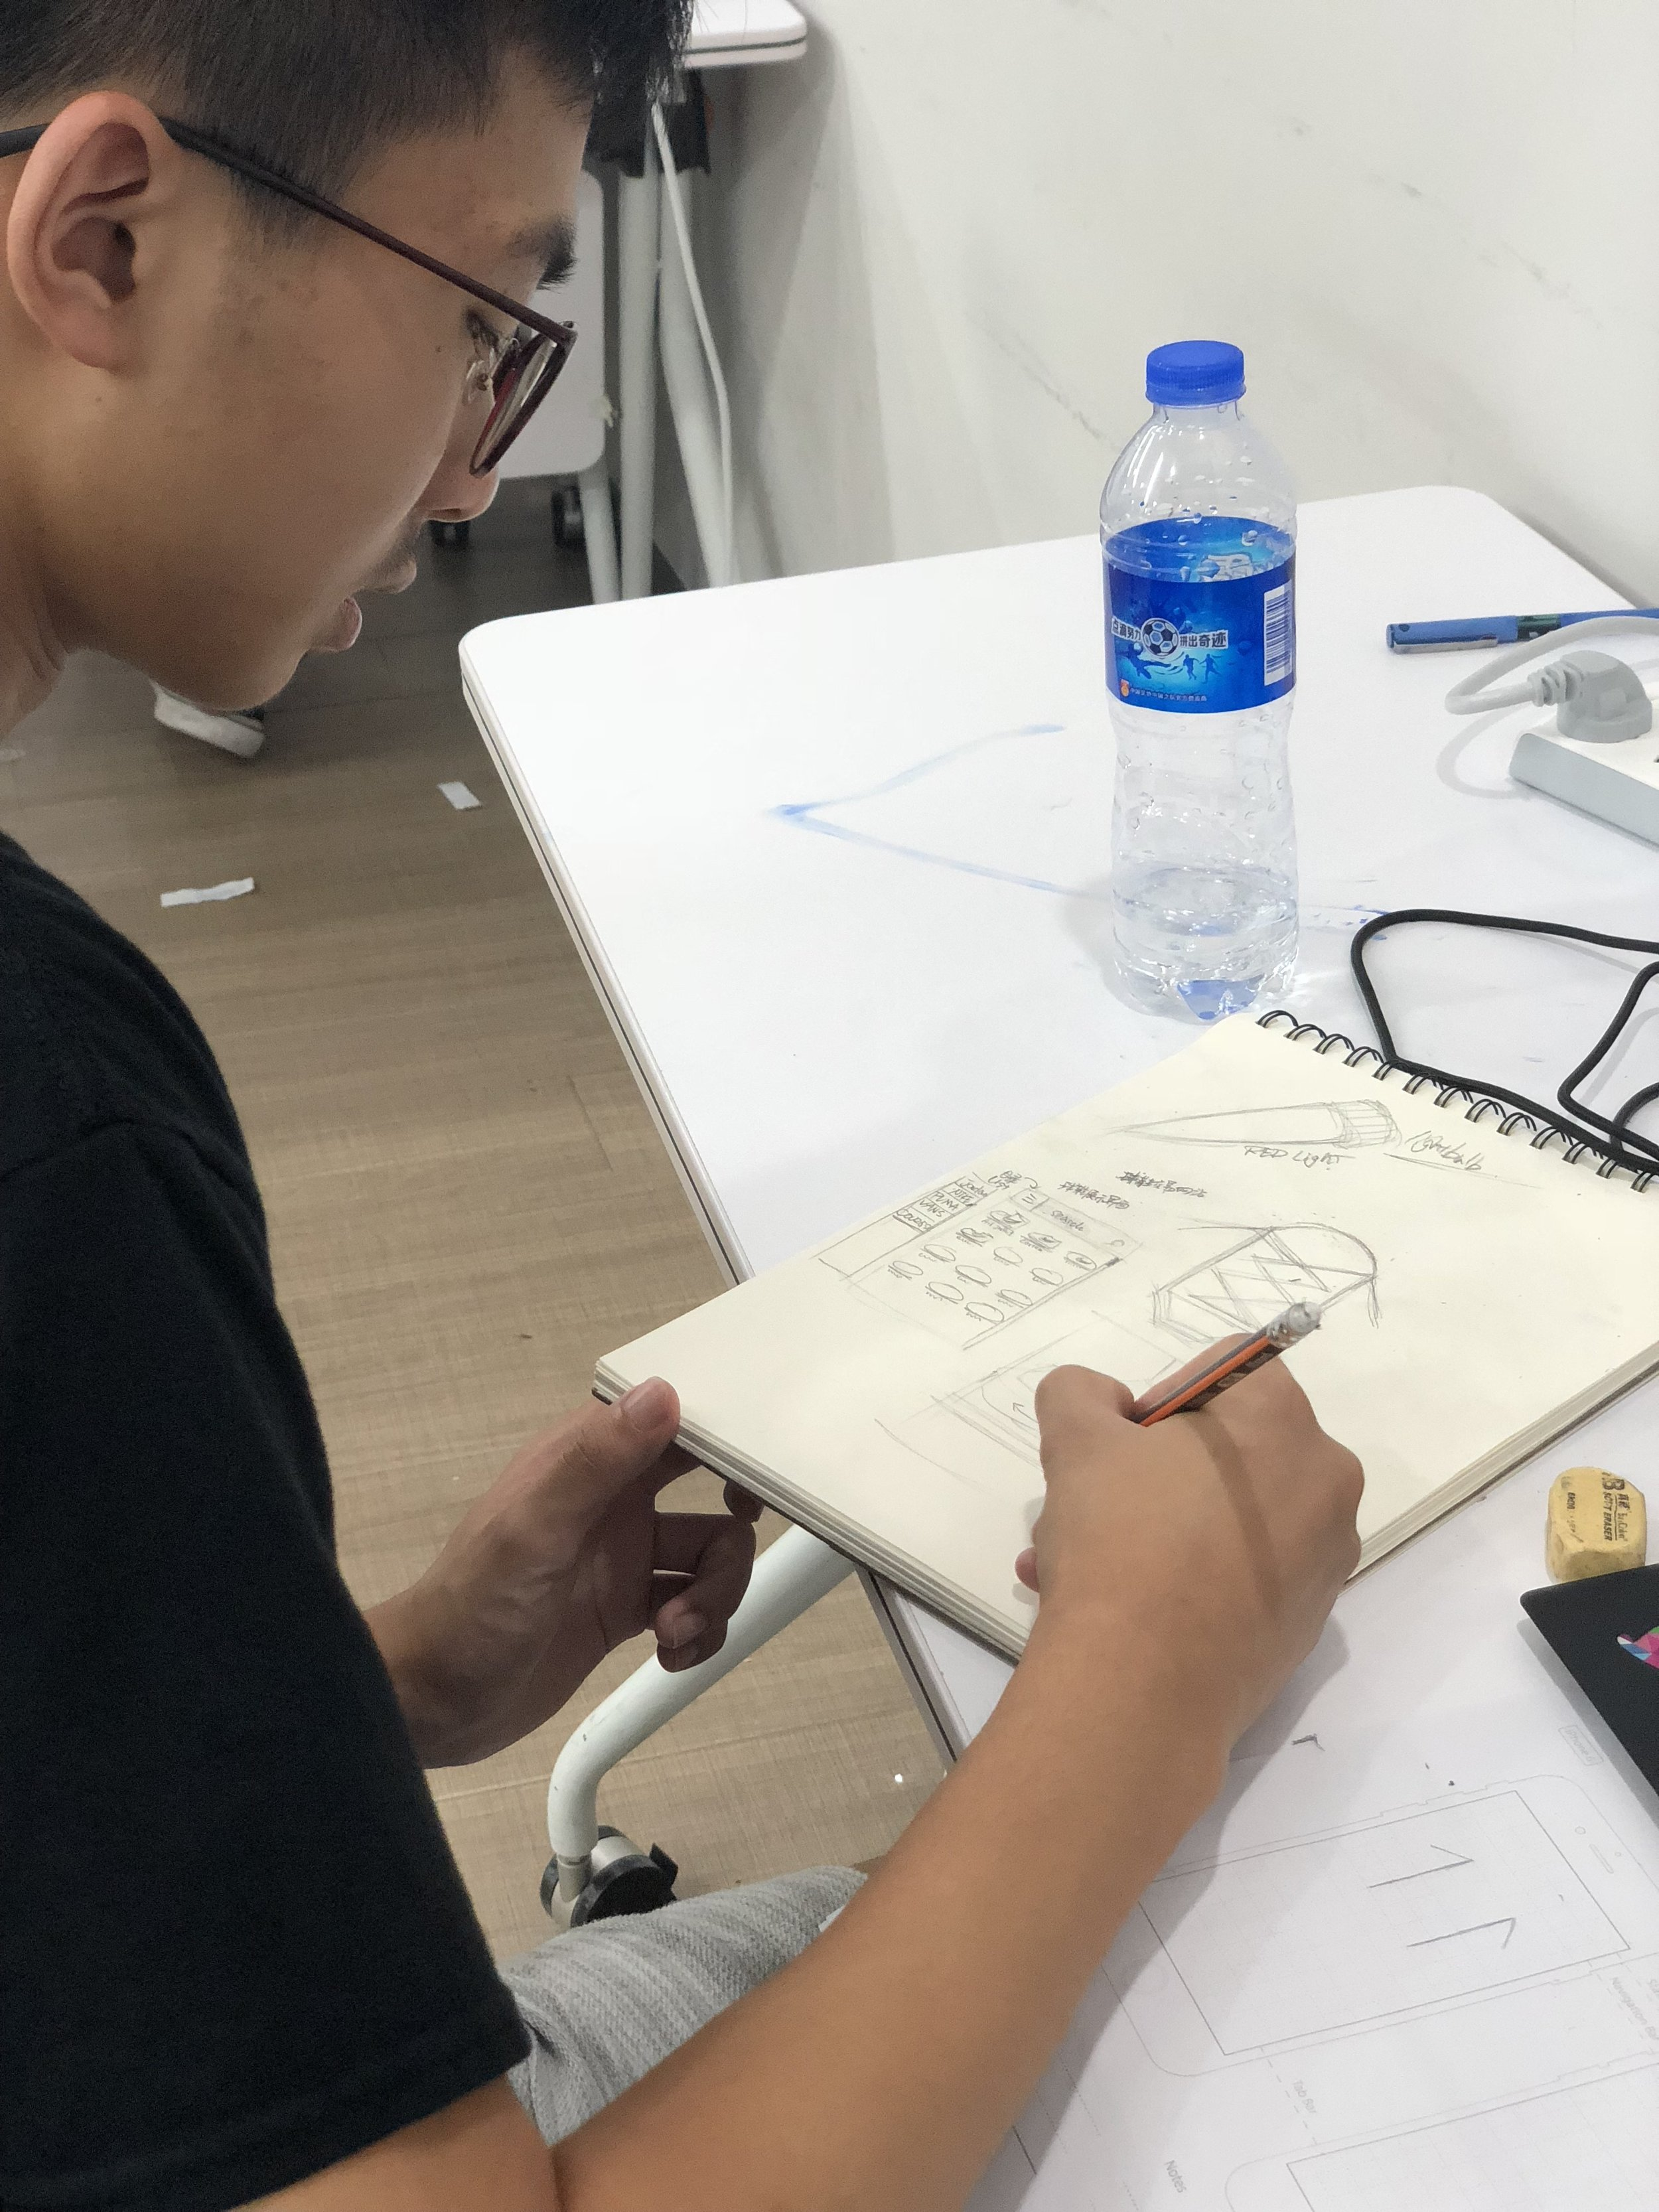 Sketching a mobile shopping UI